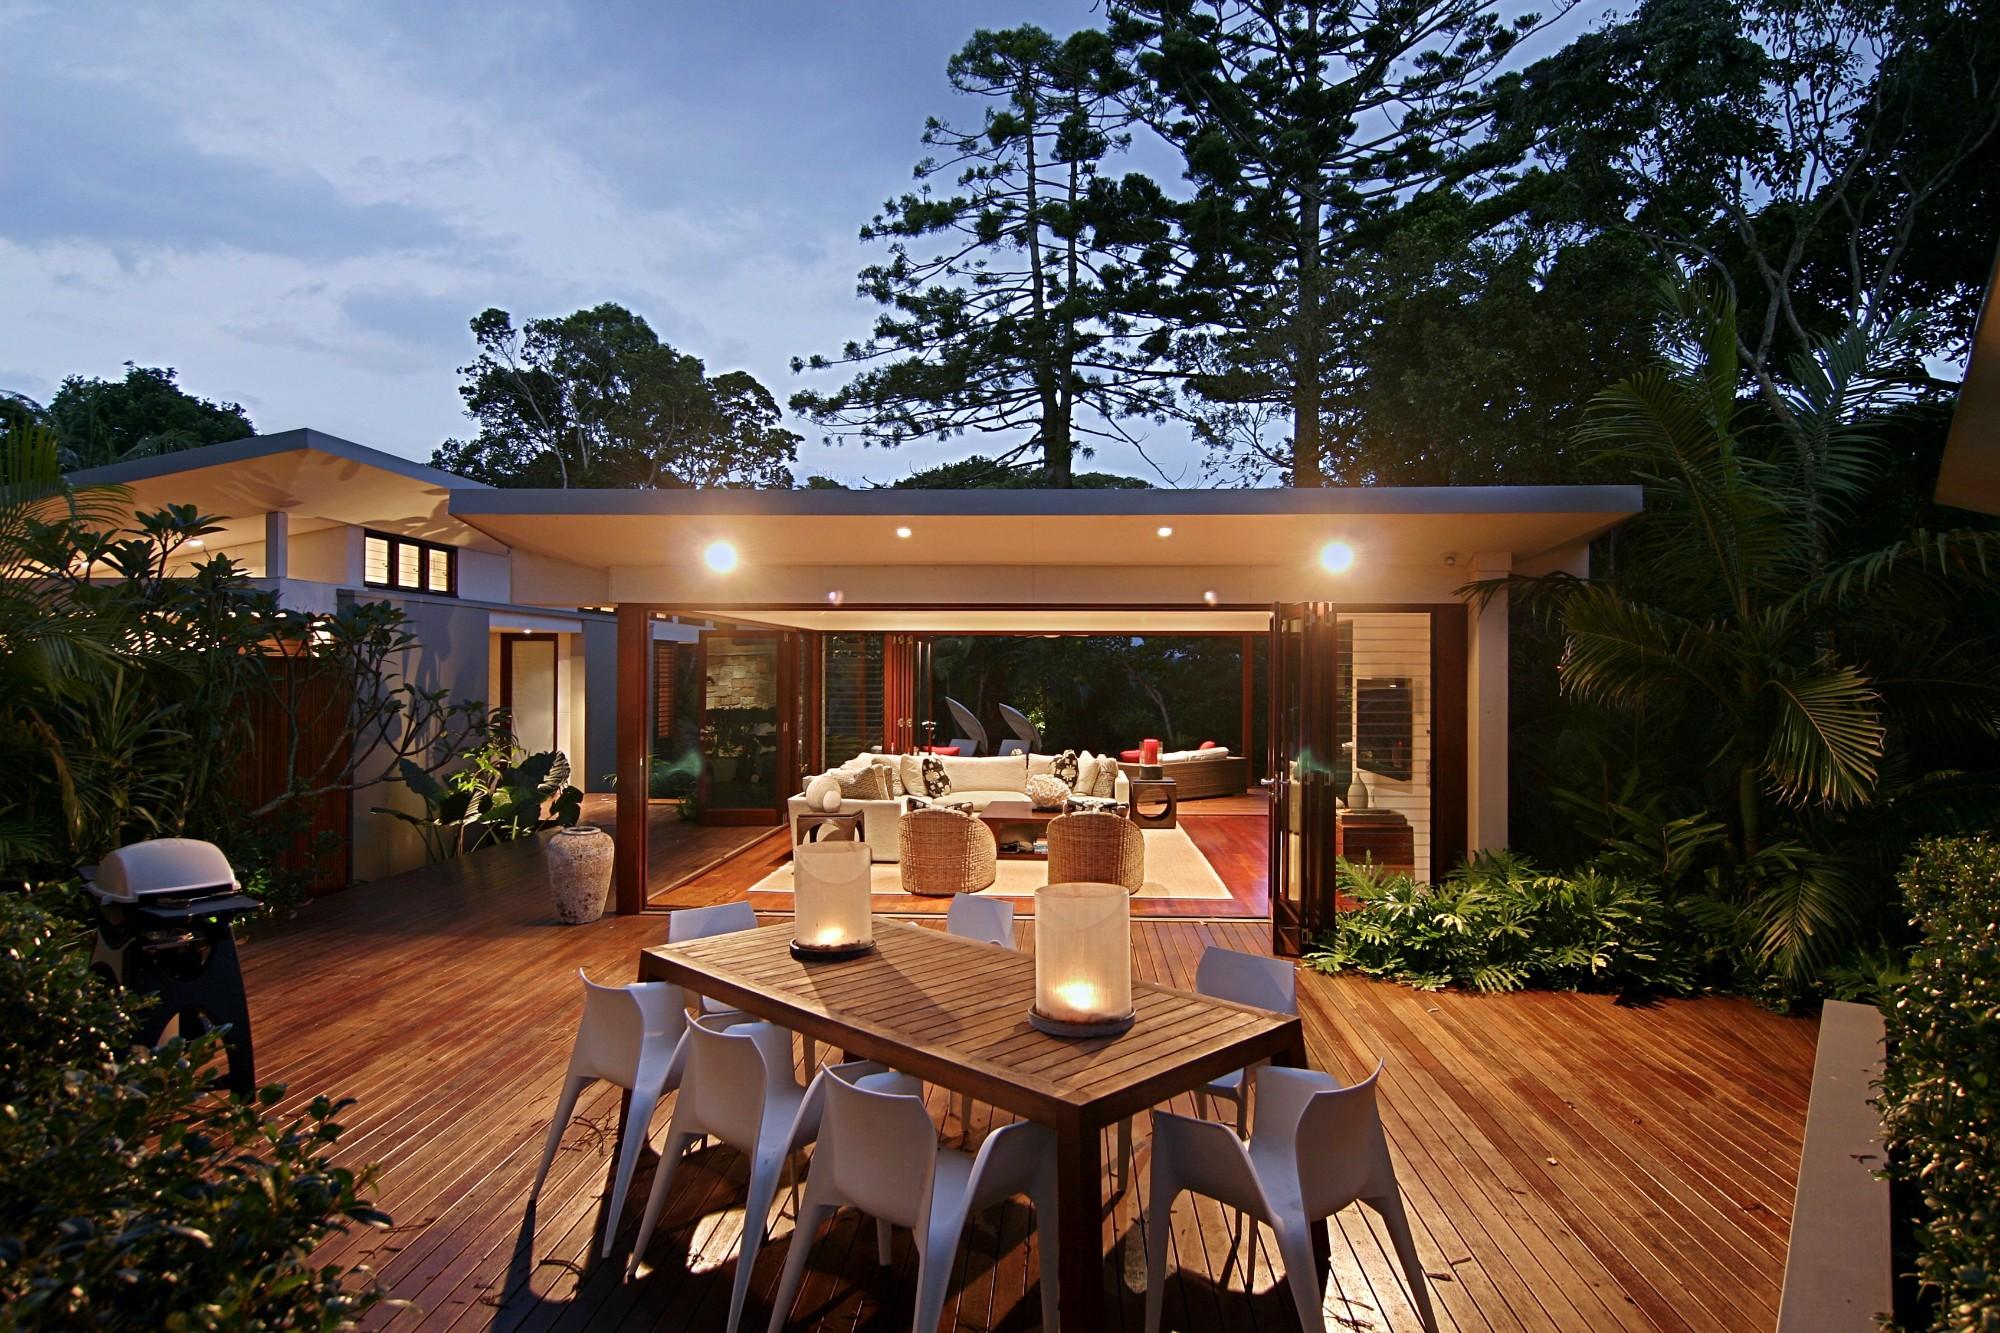 barefoot at broken byron bay byron bay holiday rentals. Black Bedroom Furniture Sets. Home Design Ideas